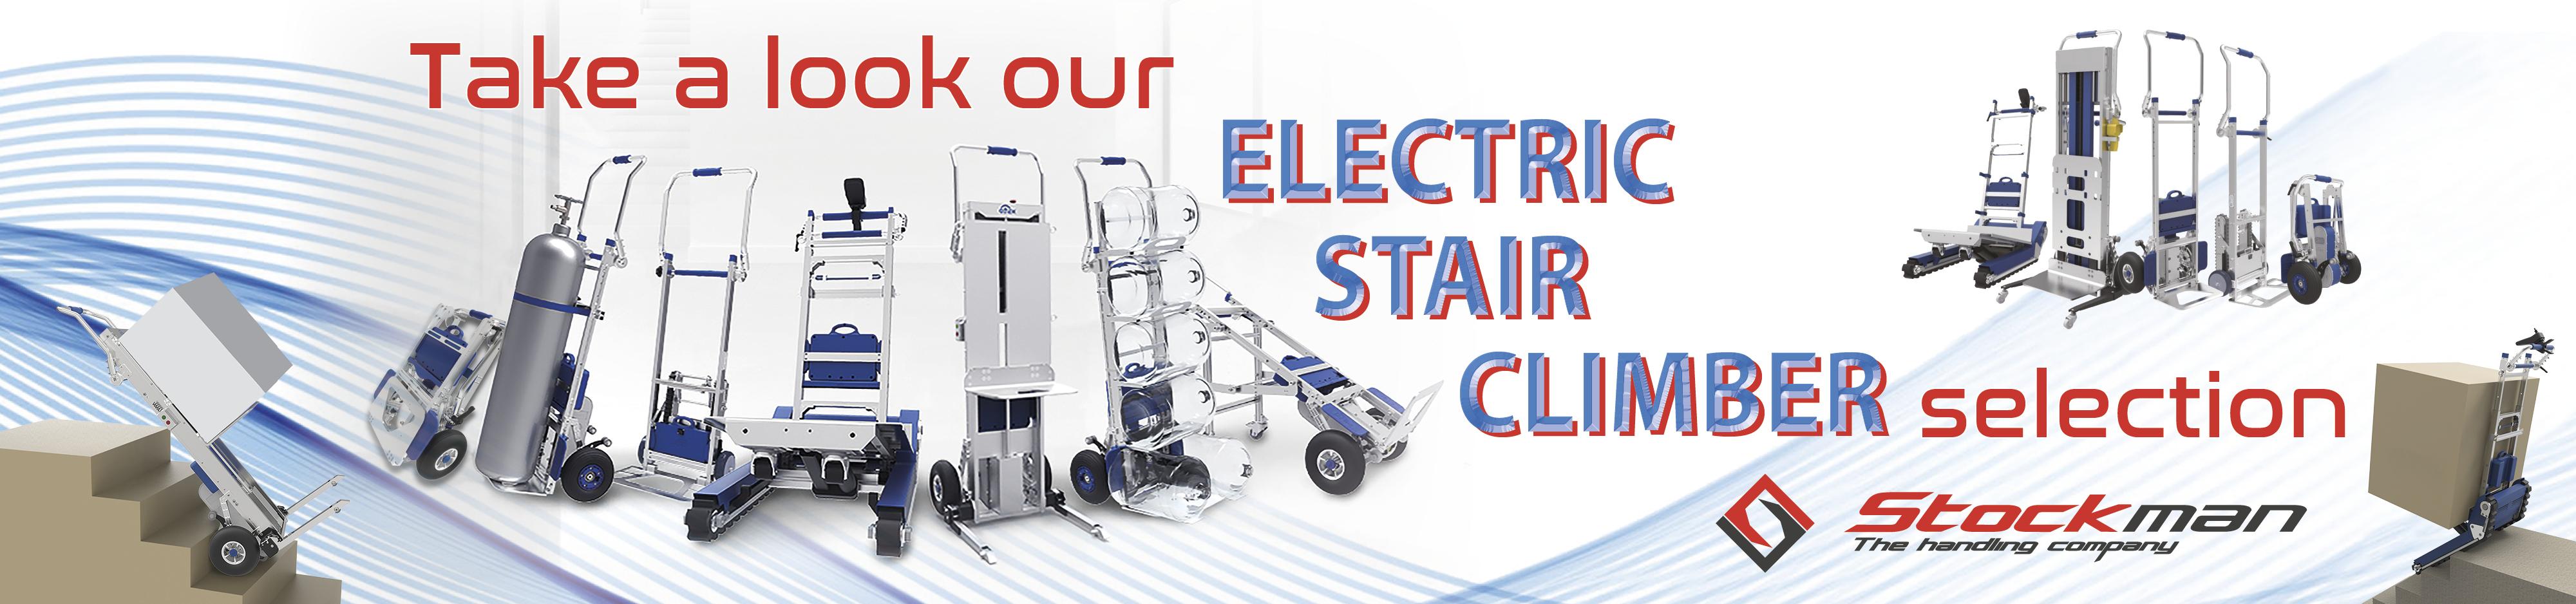 https://www.stockman.fr/sack-trucks-trolleys--6/electric-stair-climber-sack-trucks--31.aspx